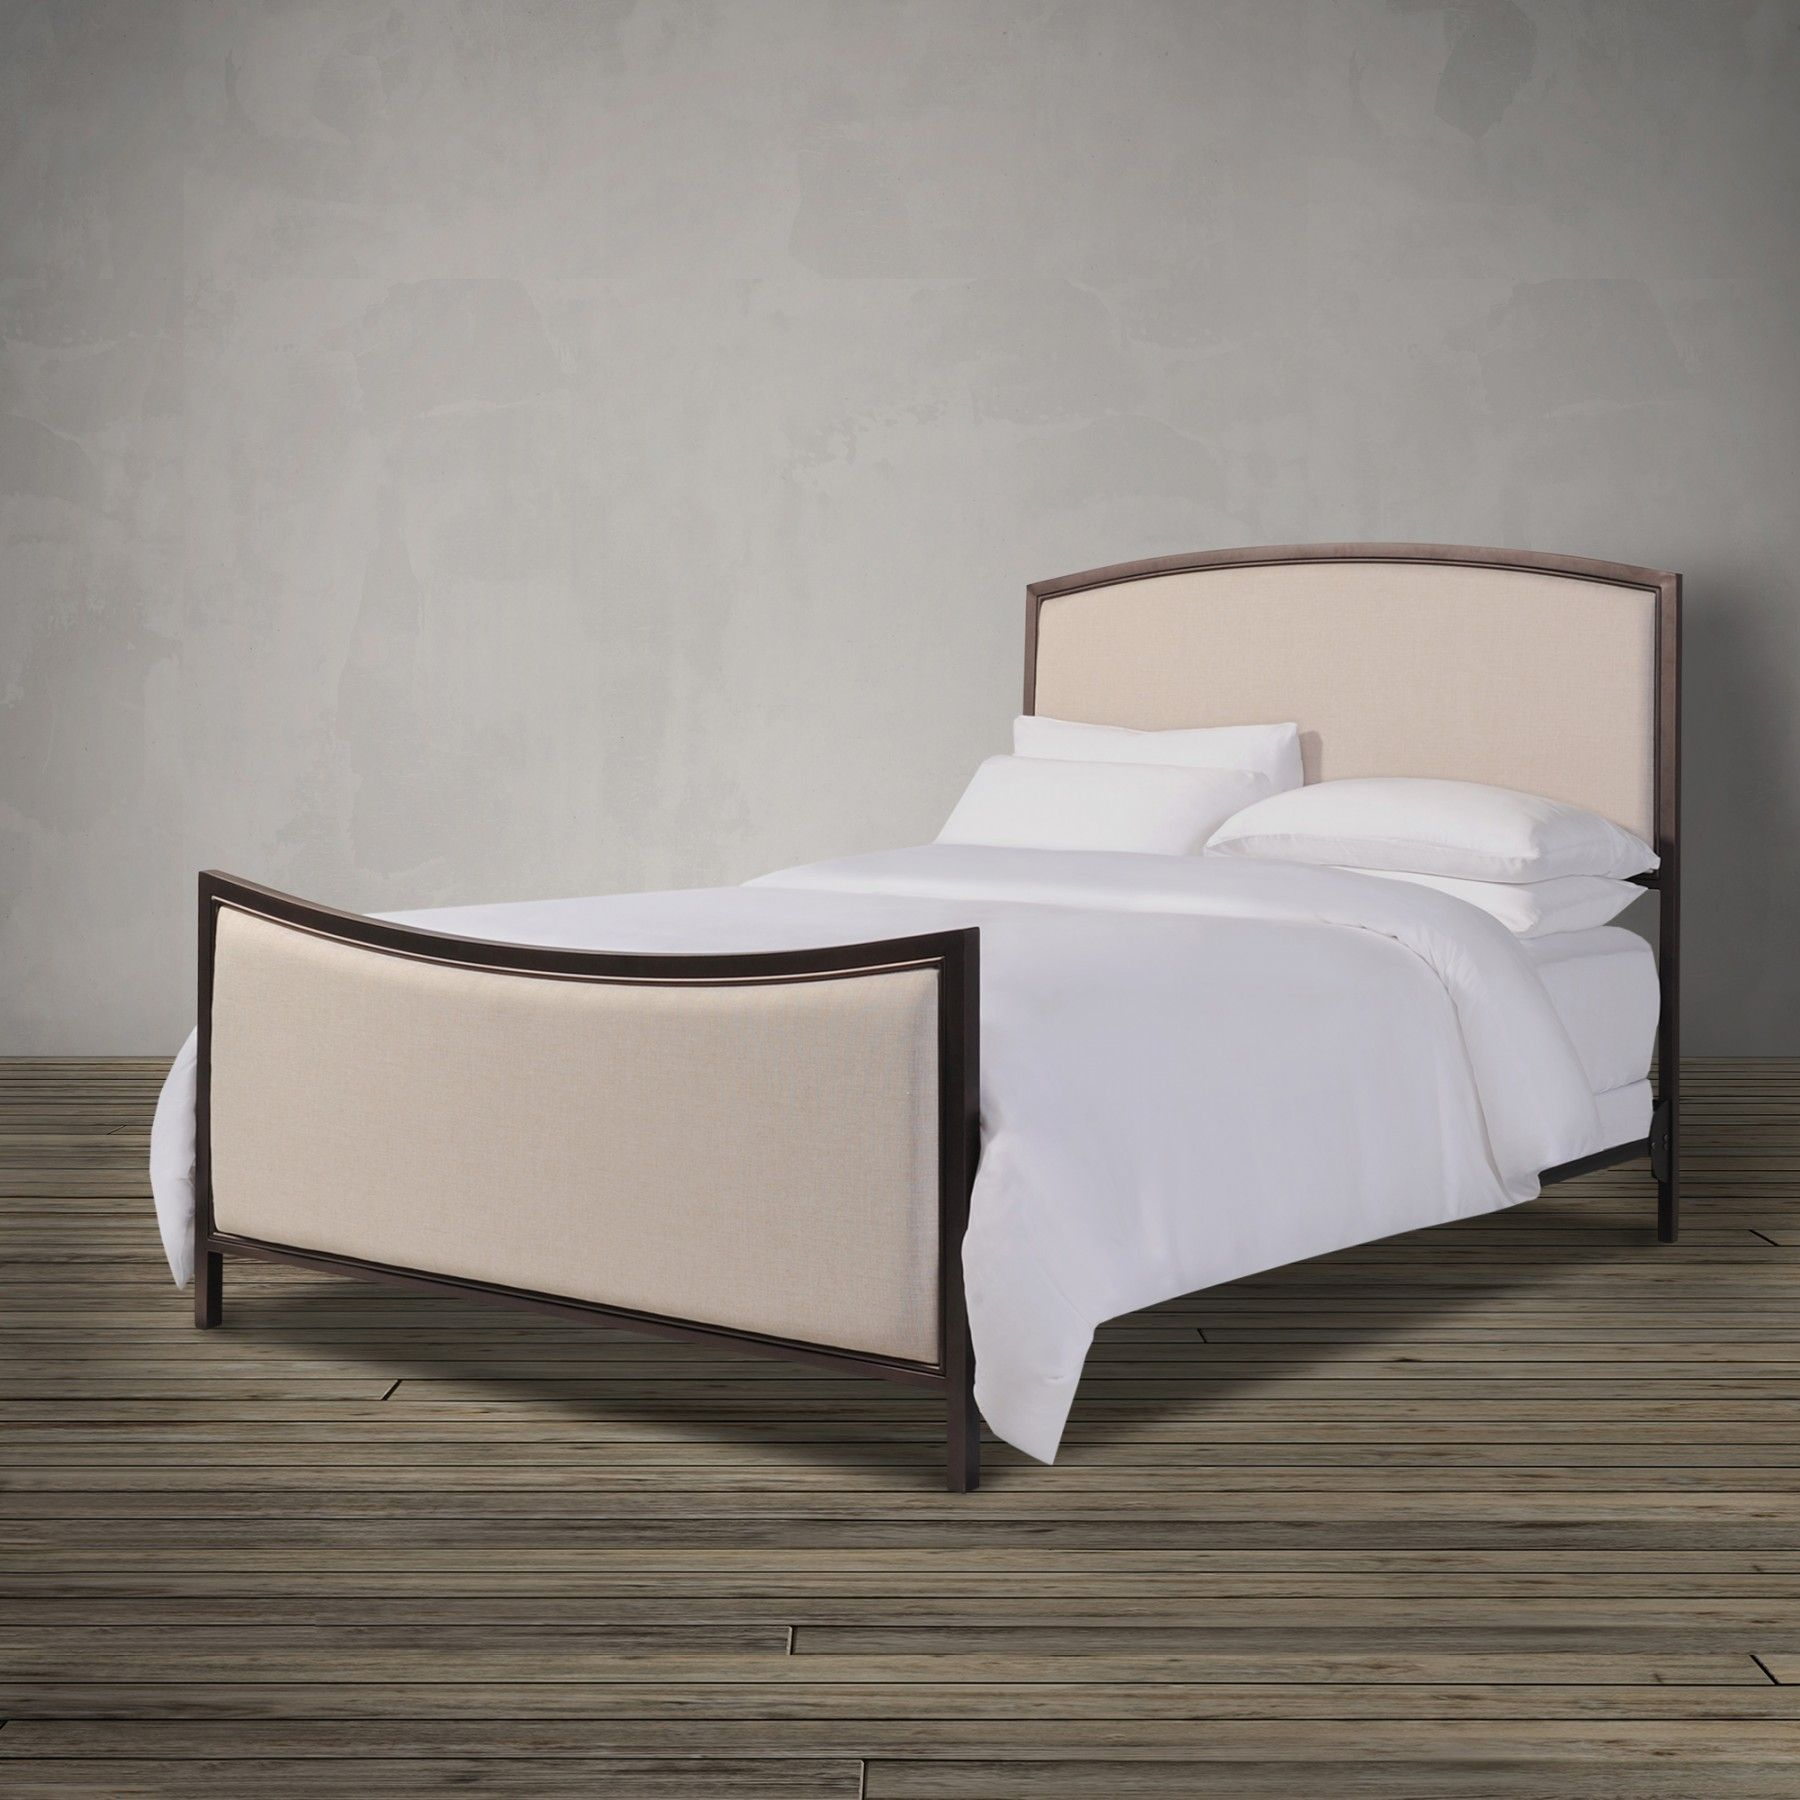 Beaudoin Bayside Bed Sleep Country Canada Headboards Bed